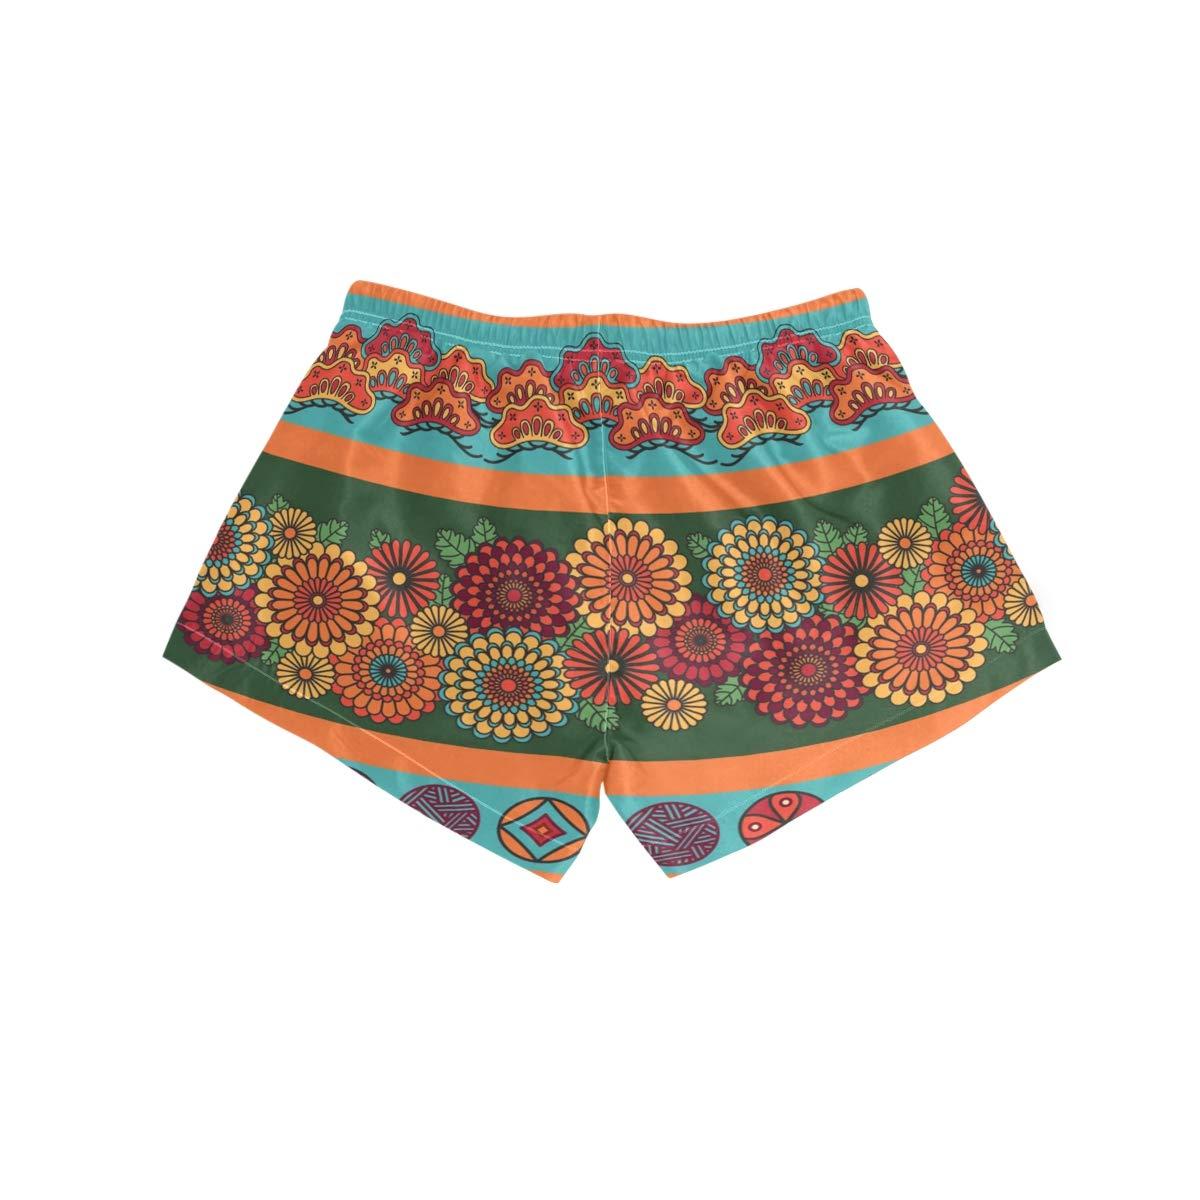 FORMRS Womens Swim Retro Pattern Board Shorts Bottom Beach Short Trunk Swimwear with Drawstring